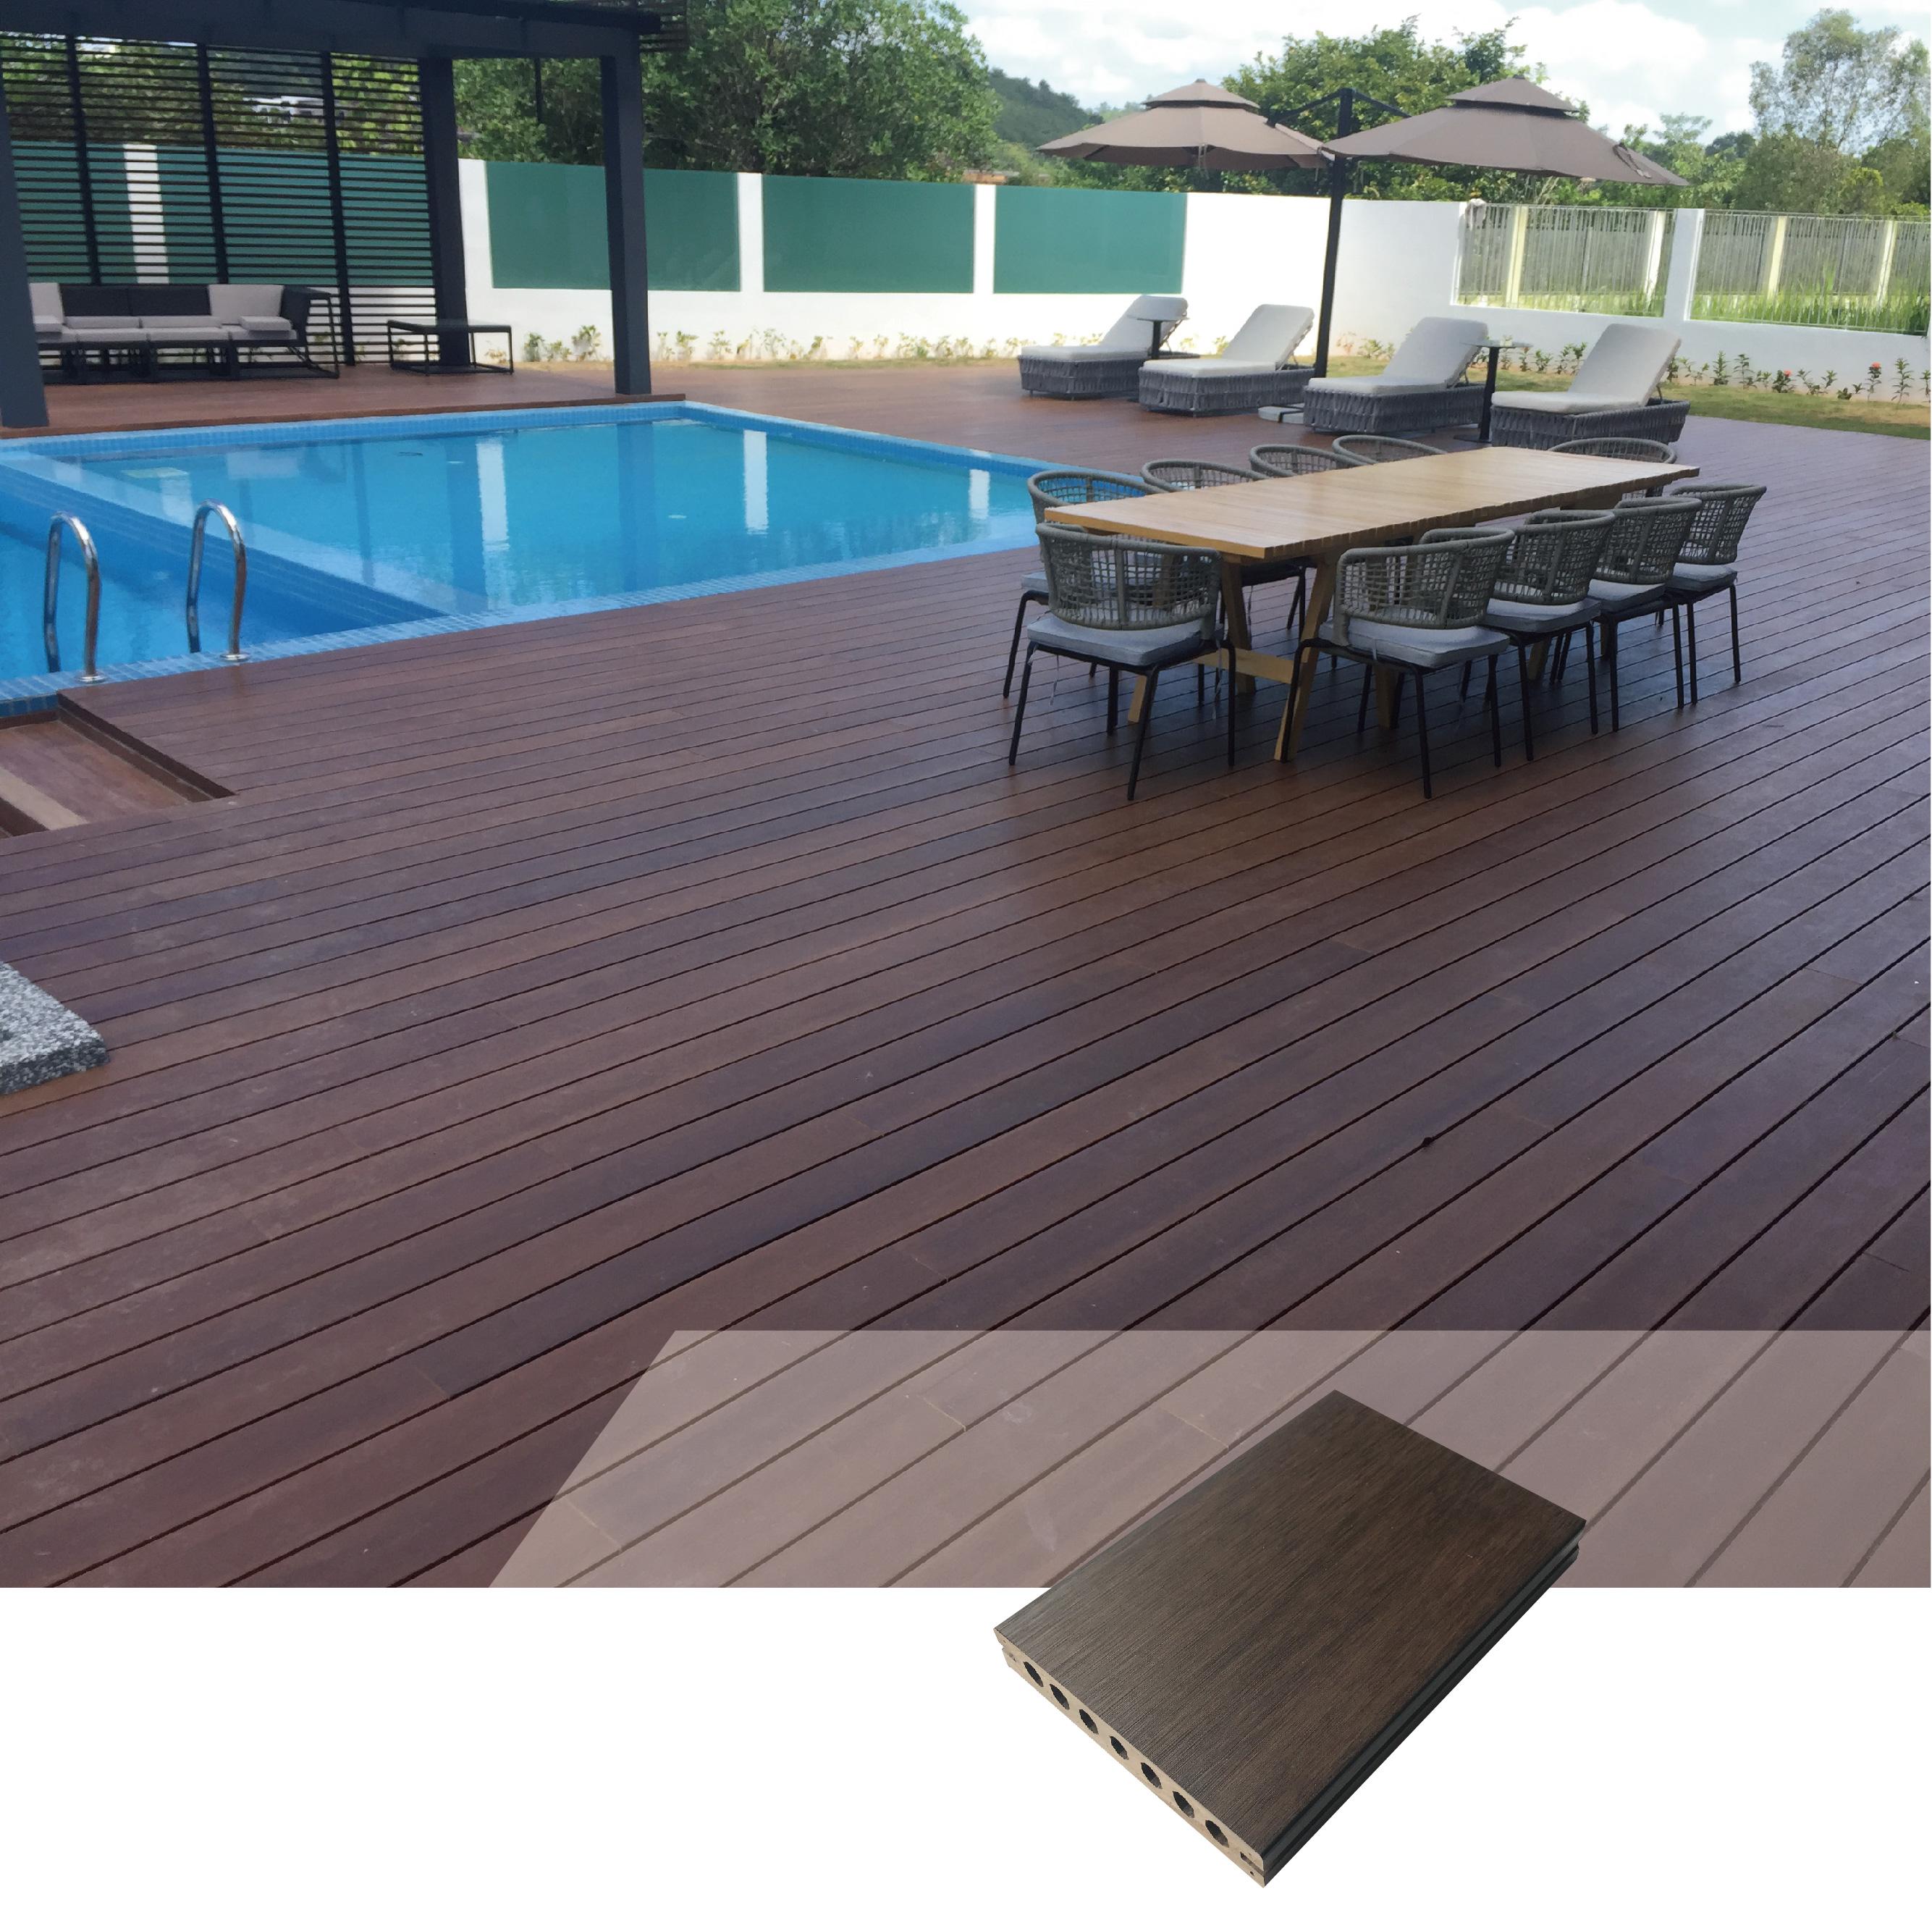 Wpc Waterproof Wood Plastic Composite